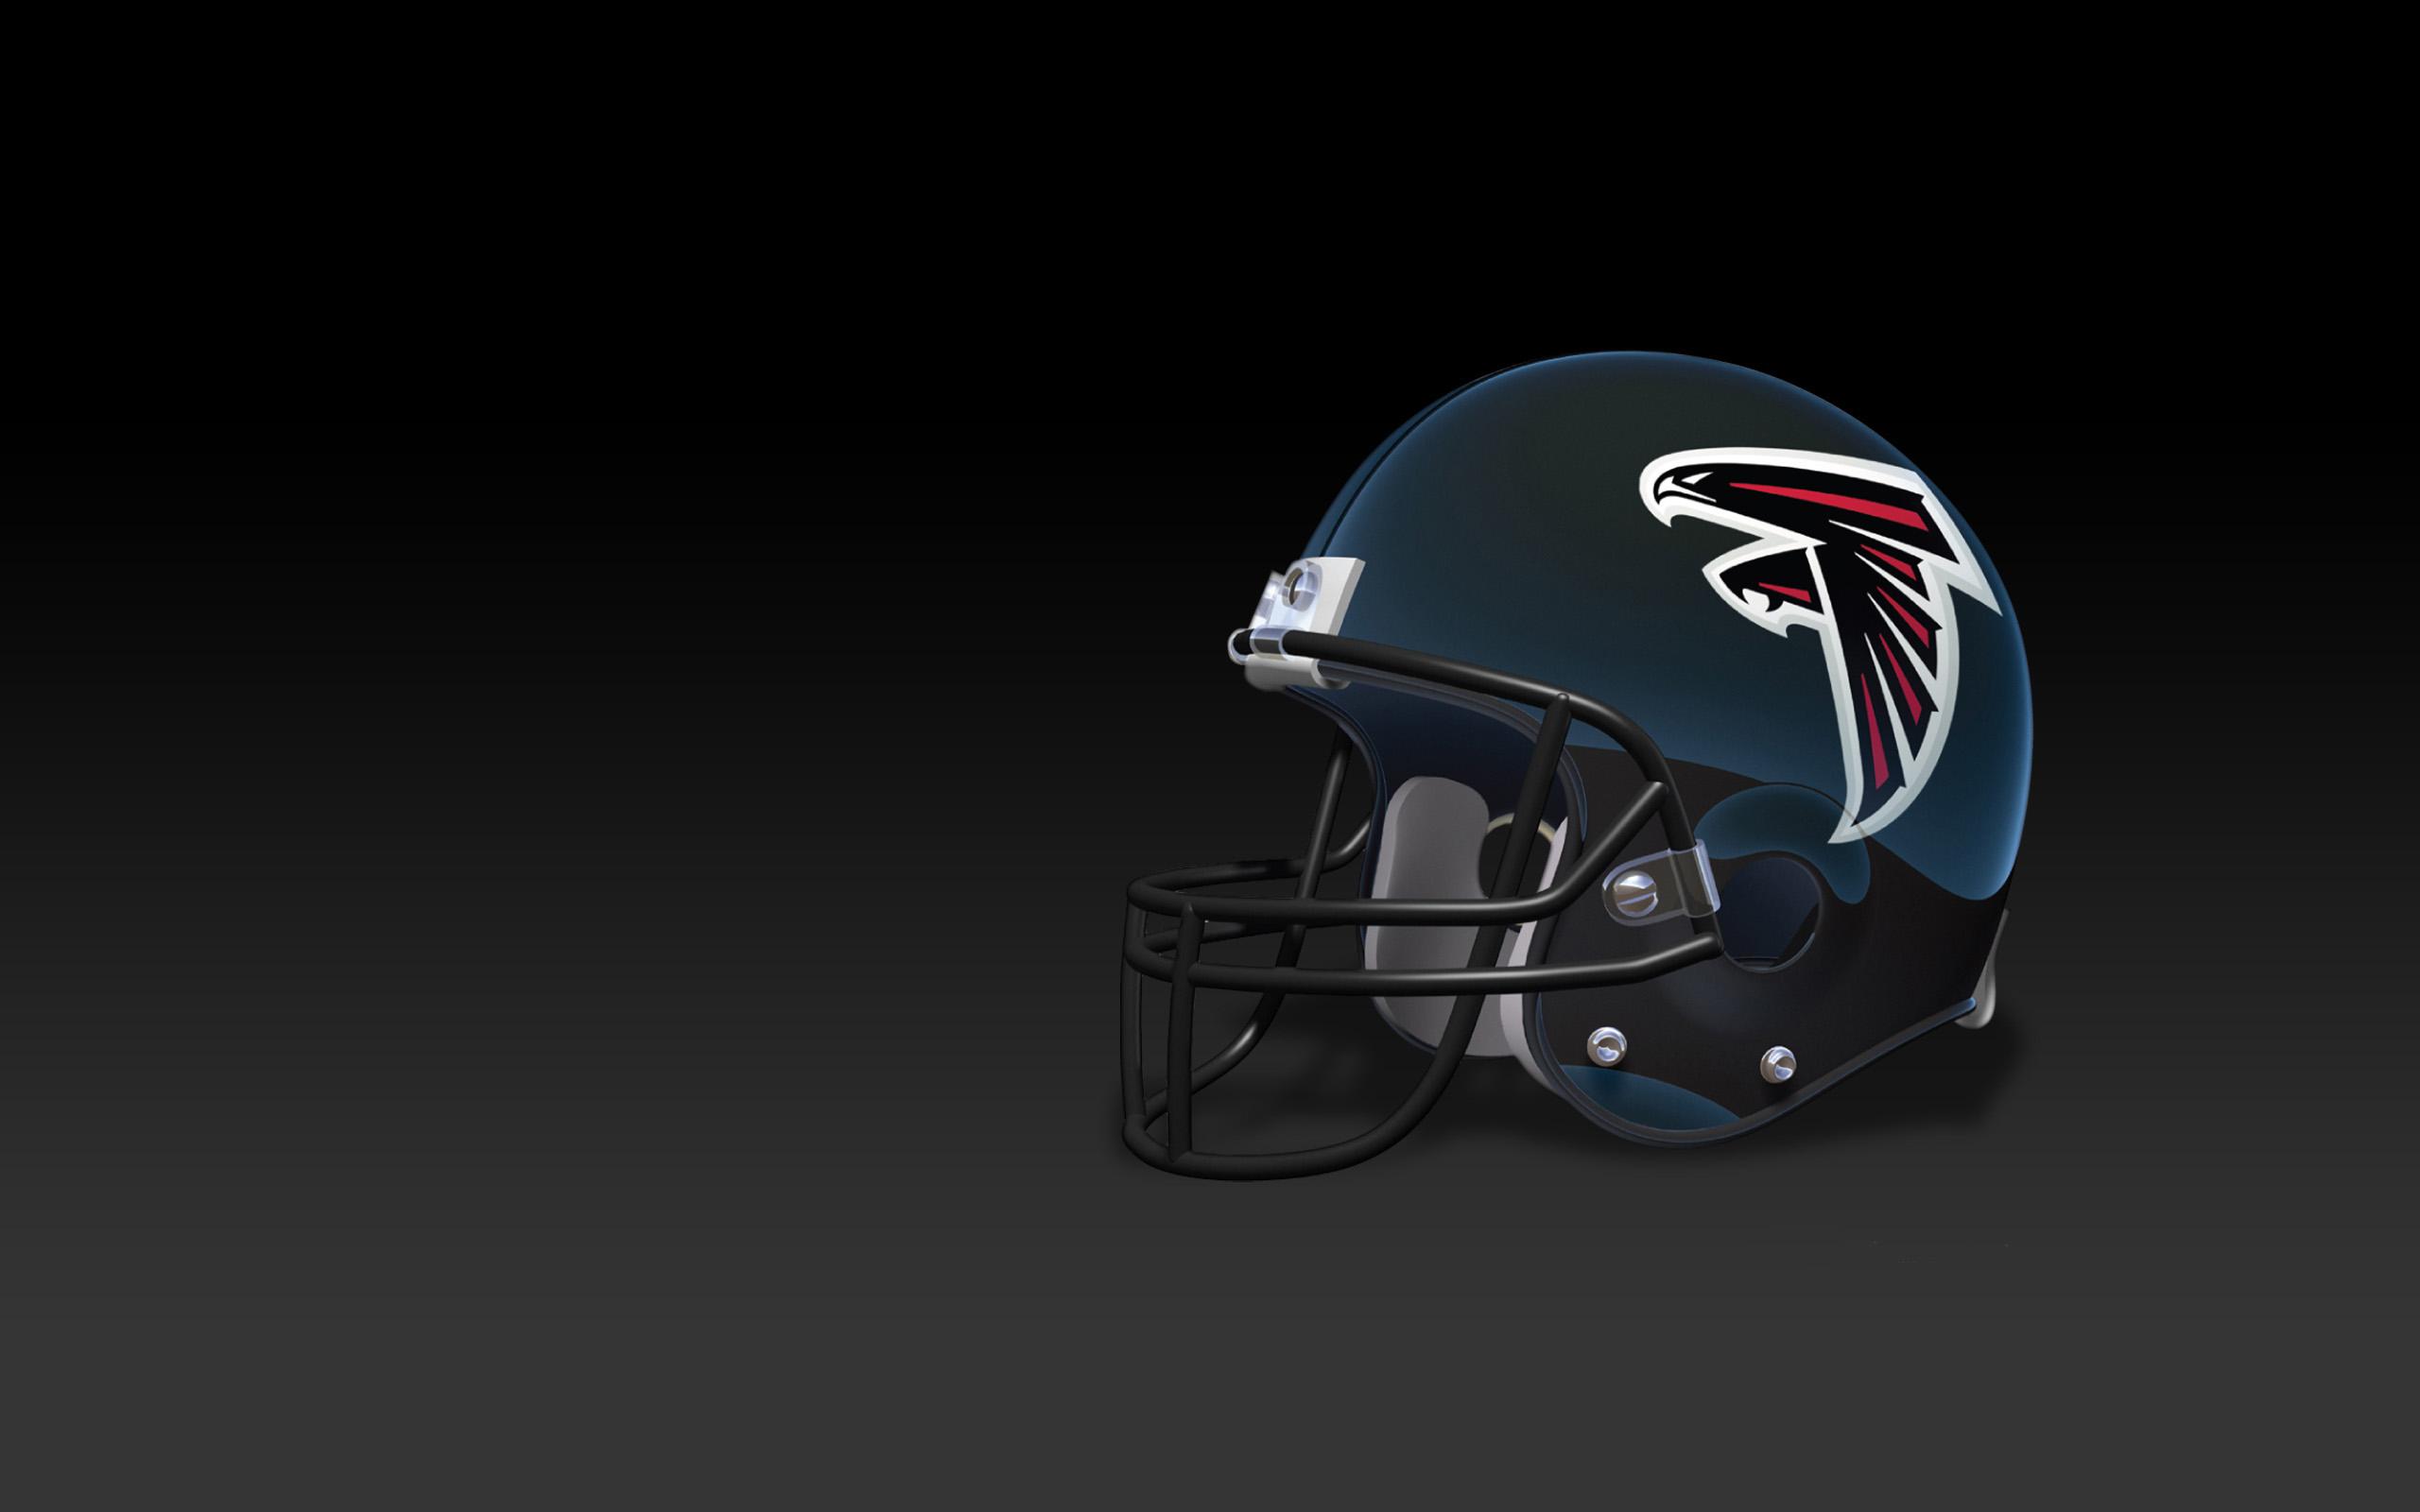 Images Of The Atlanta Falcons Football Logos: NFL Team Logos Wallpapers (2560 X 1600 Pixels)